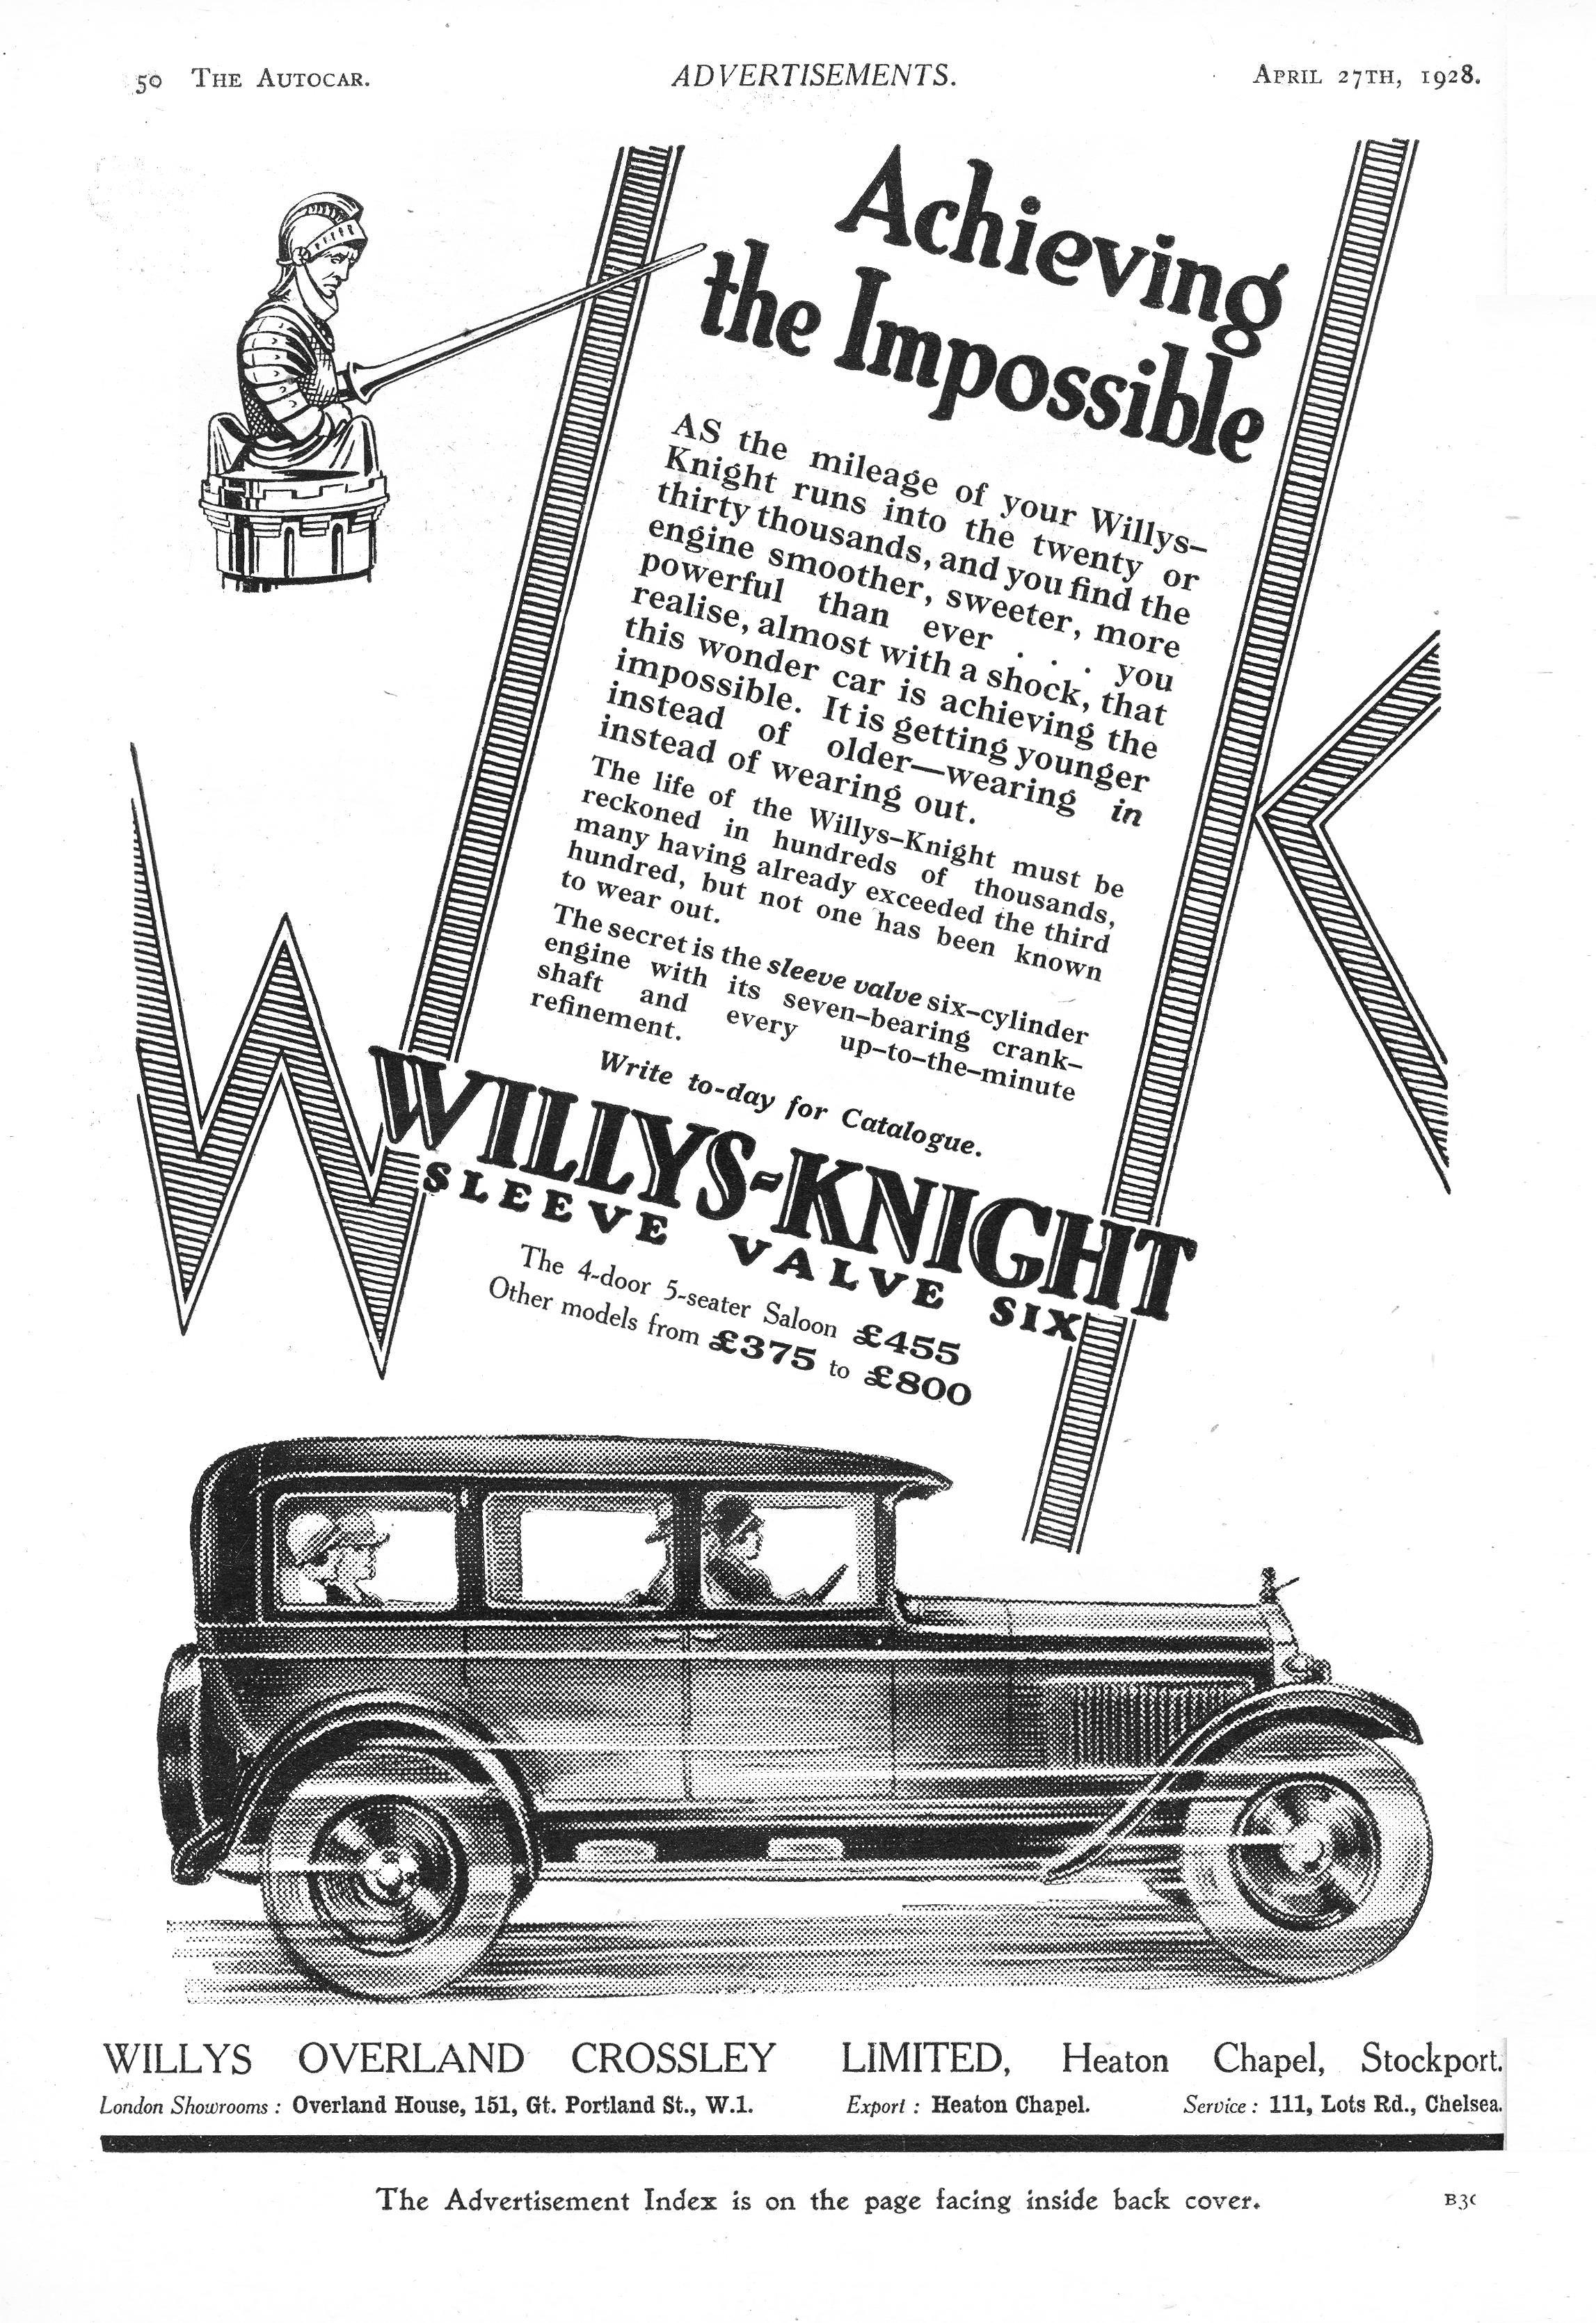 Willys Knight Sleeve Valve Six Saloon Motor Car Autocar